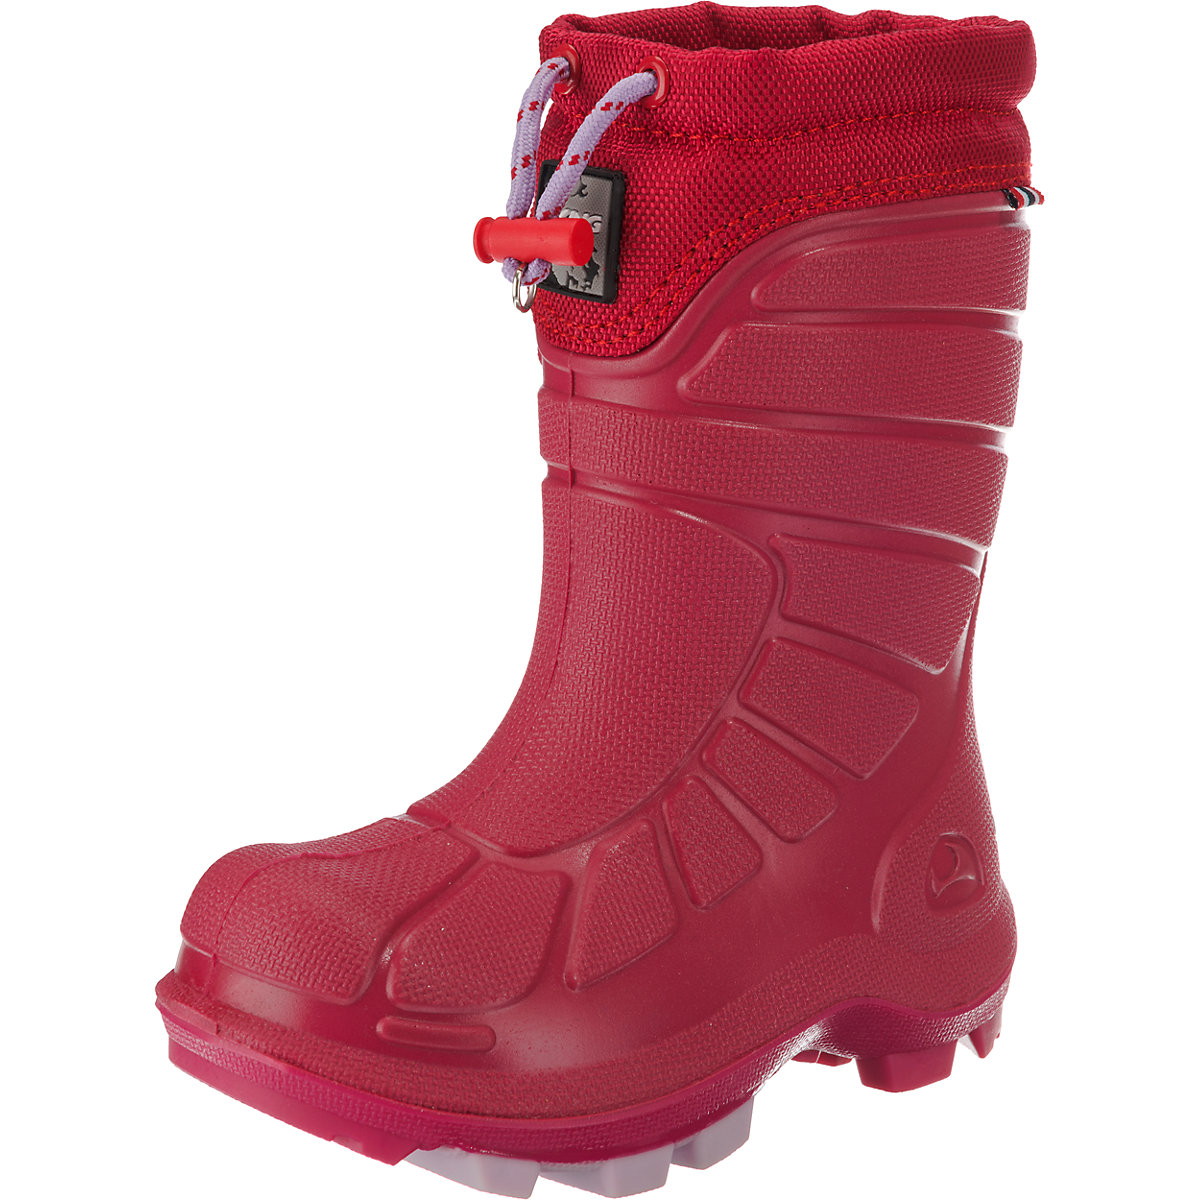 Фото - VIKING Boots 8675413 Winter Girls Wool children shoes MTpromo viking boots 10649388 winter baby boy shoes